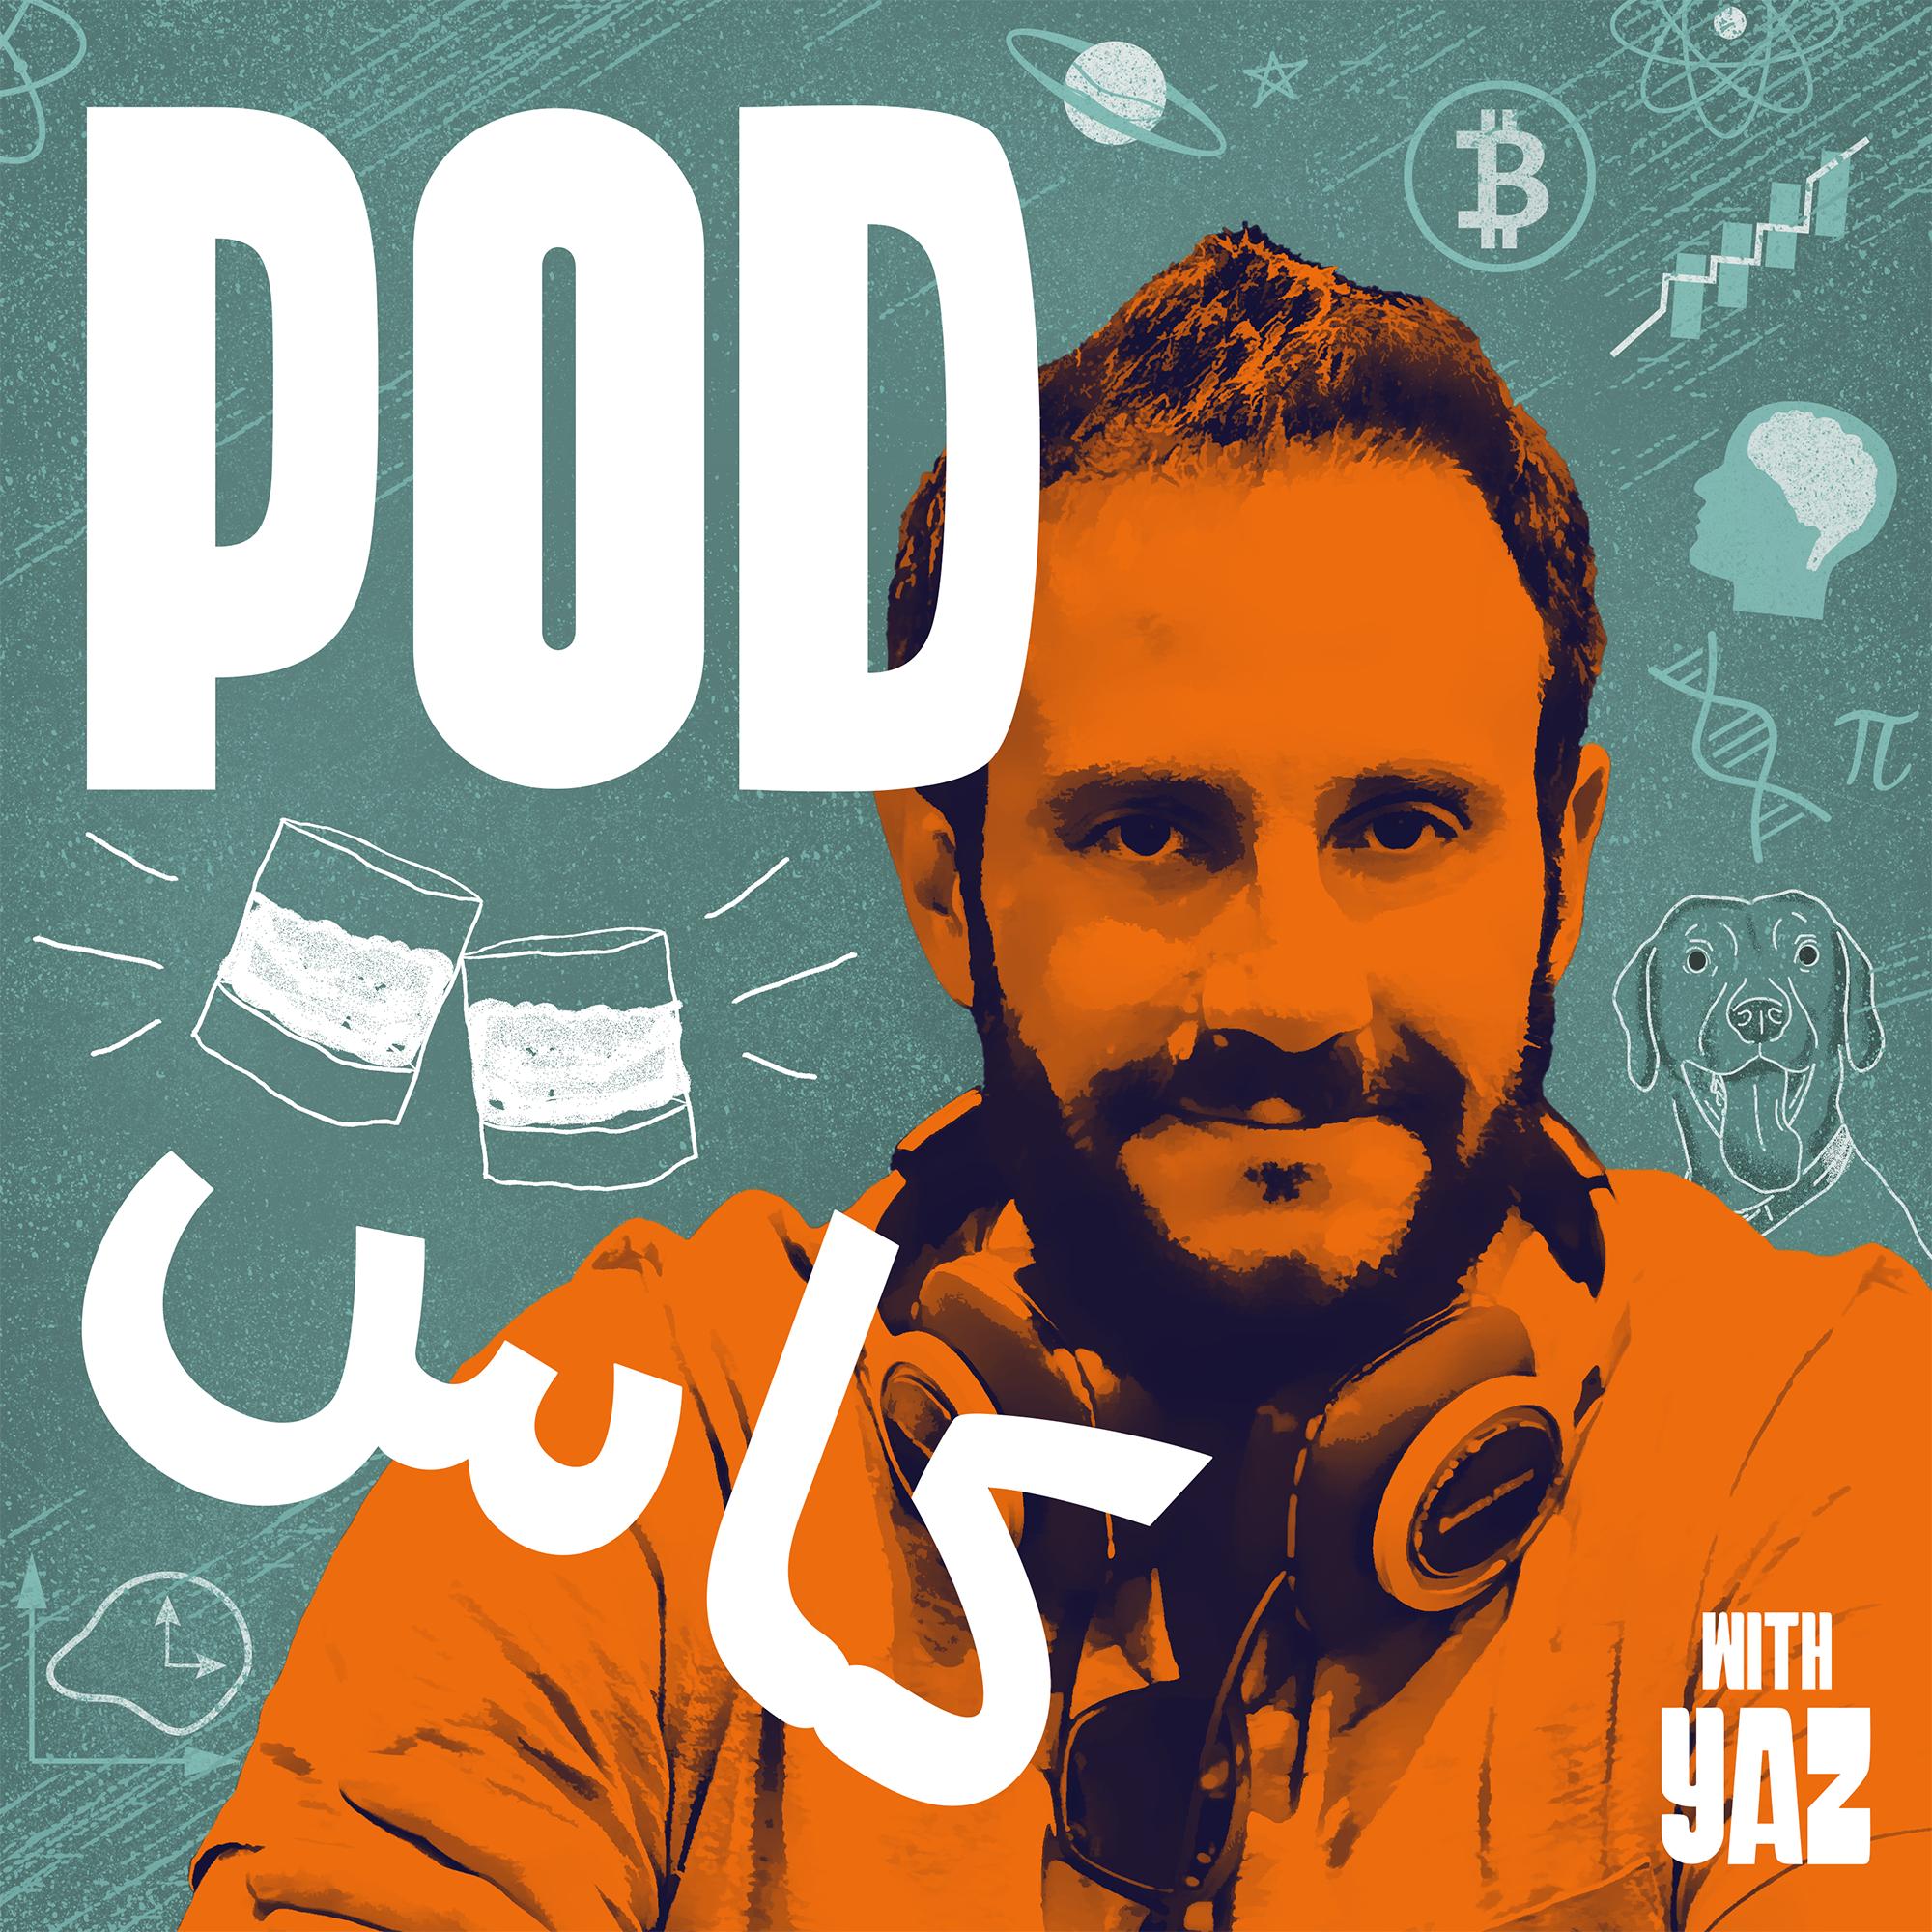 Podcast cover artwork (similar to Joe Rogan Experience)